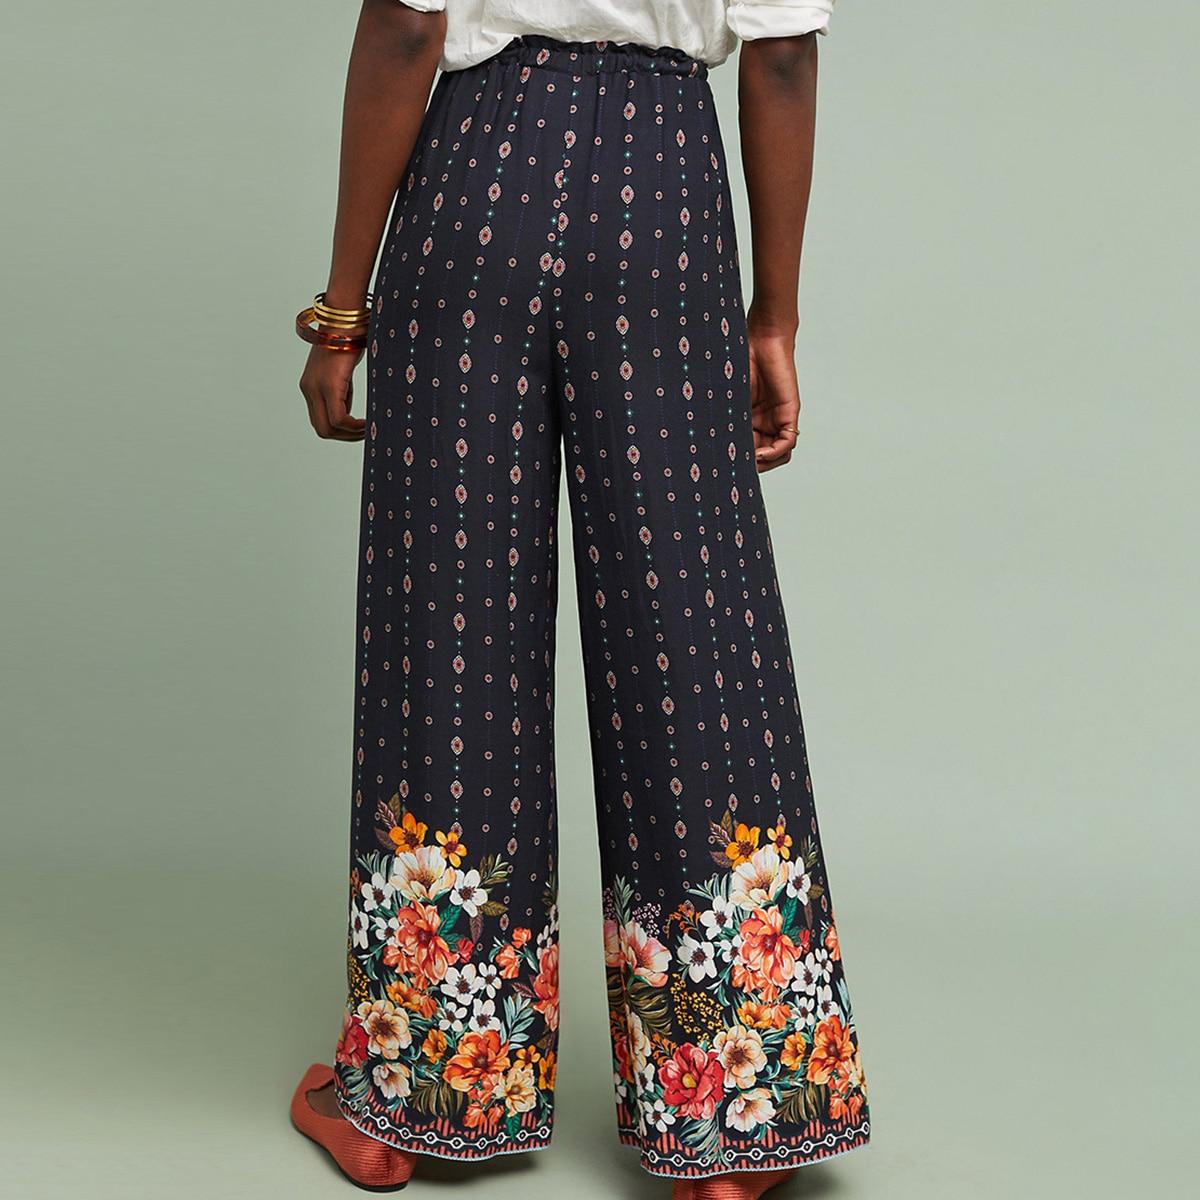 Ethnic Floral Wide-Leg Pants 2019 Summer Women High Waist Loose Pant Ladies Vint